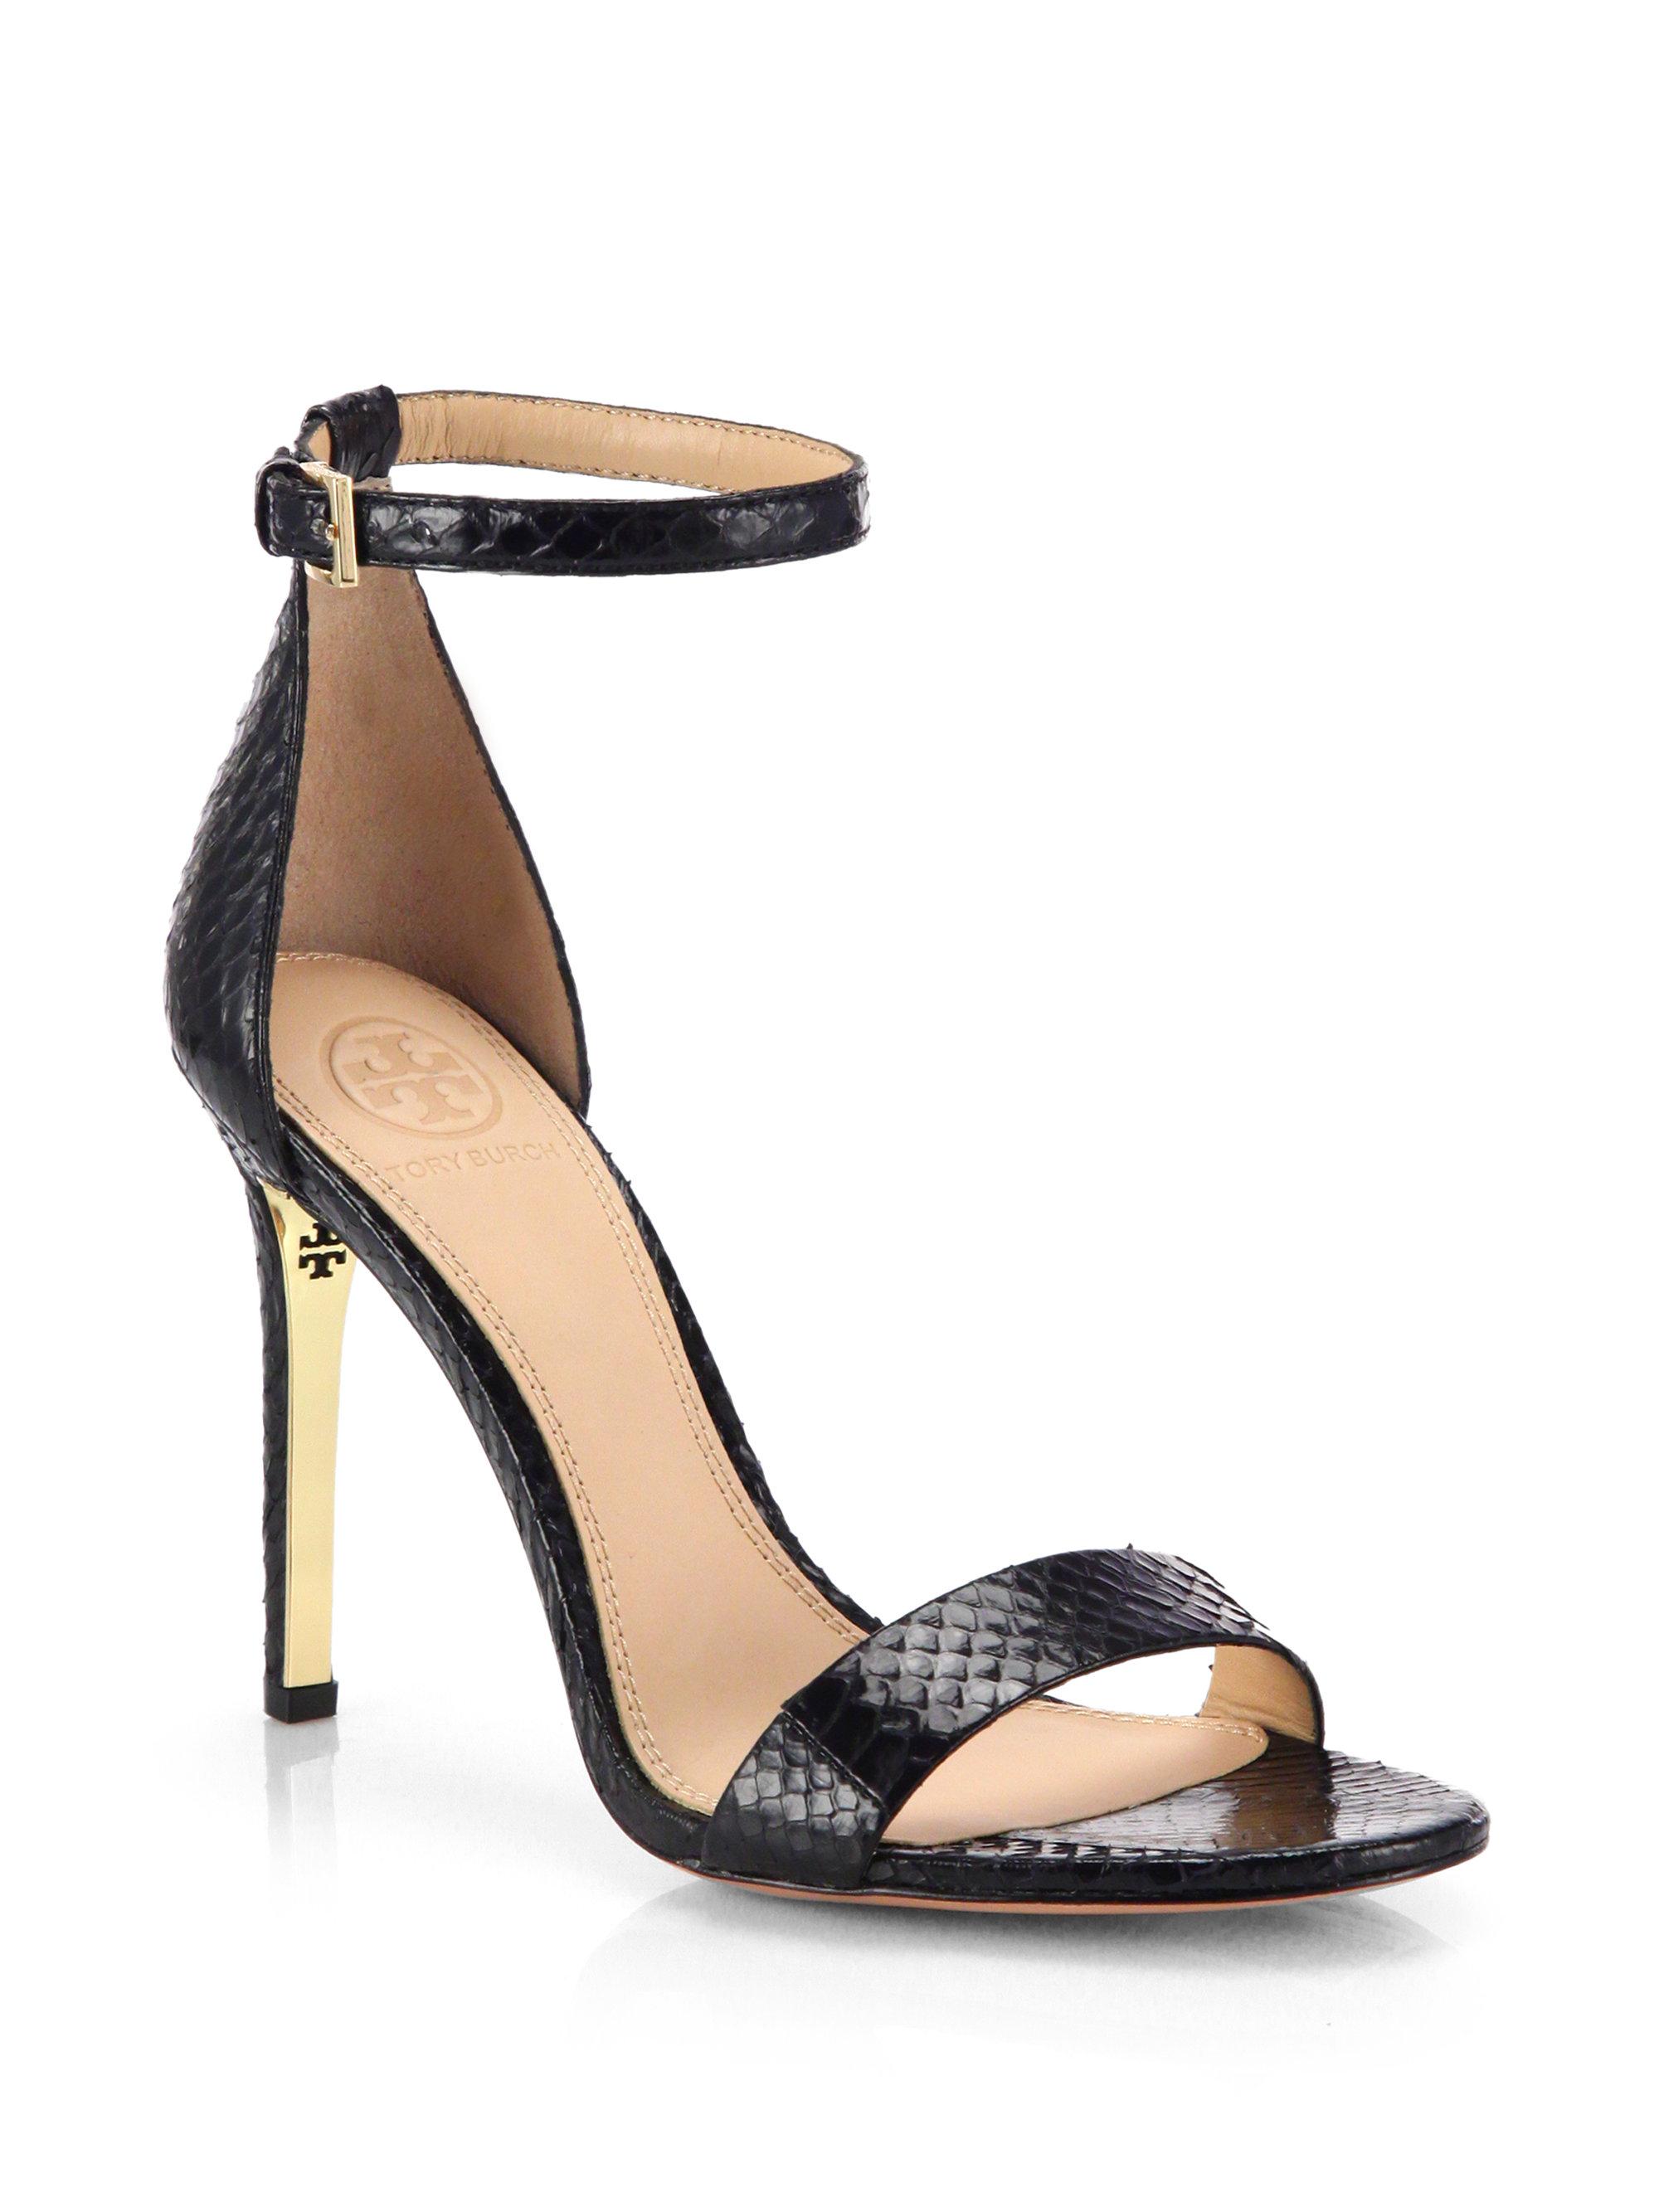 1a8c5518f99a Lyst - Tory Burch Keri Snakeskin Sandals in Black